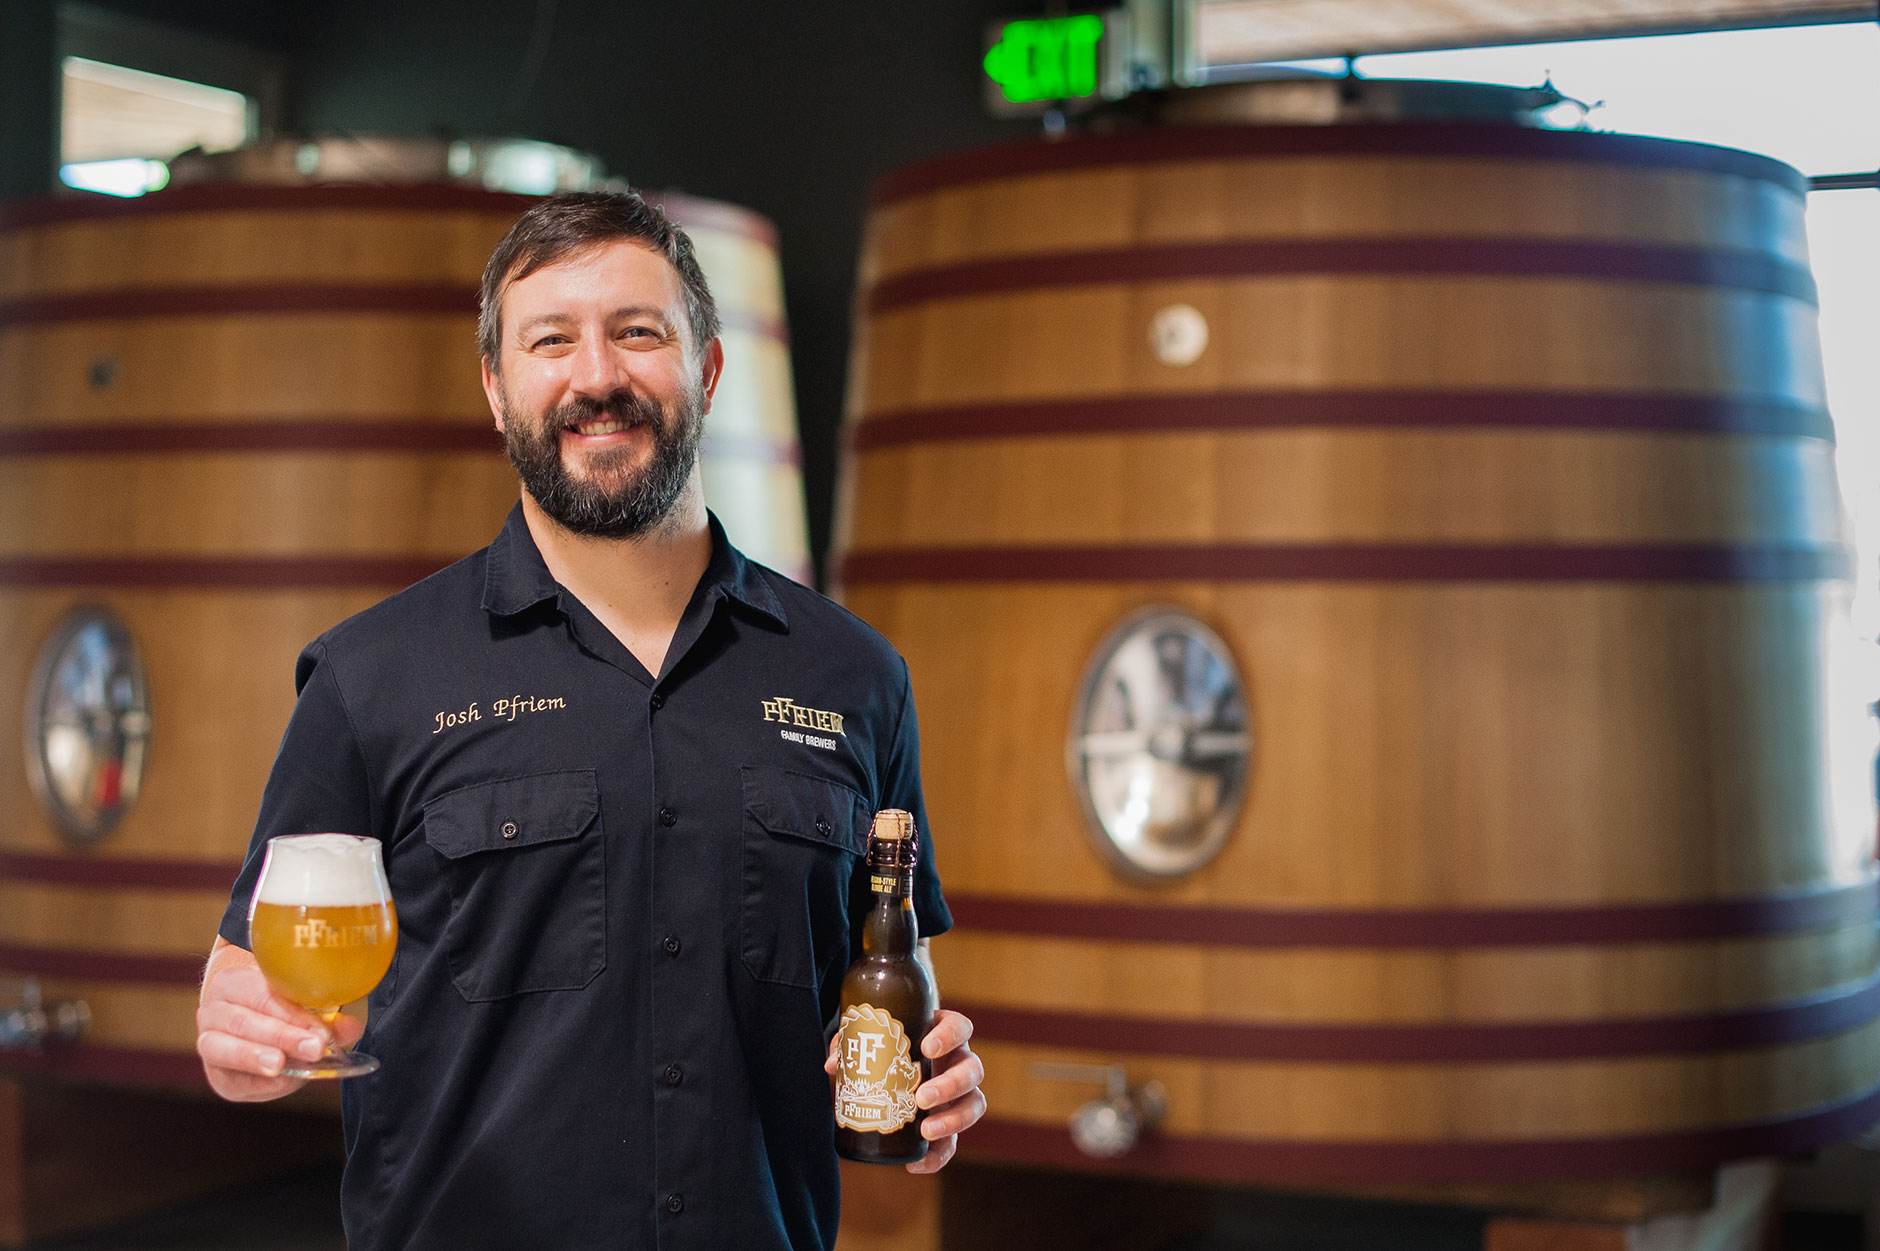 Джош Фрим (Josh Pfriem), владелец и главный пивовар pFriem Family Brewers. Фото: Oh Beautiful Beer